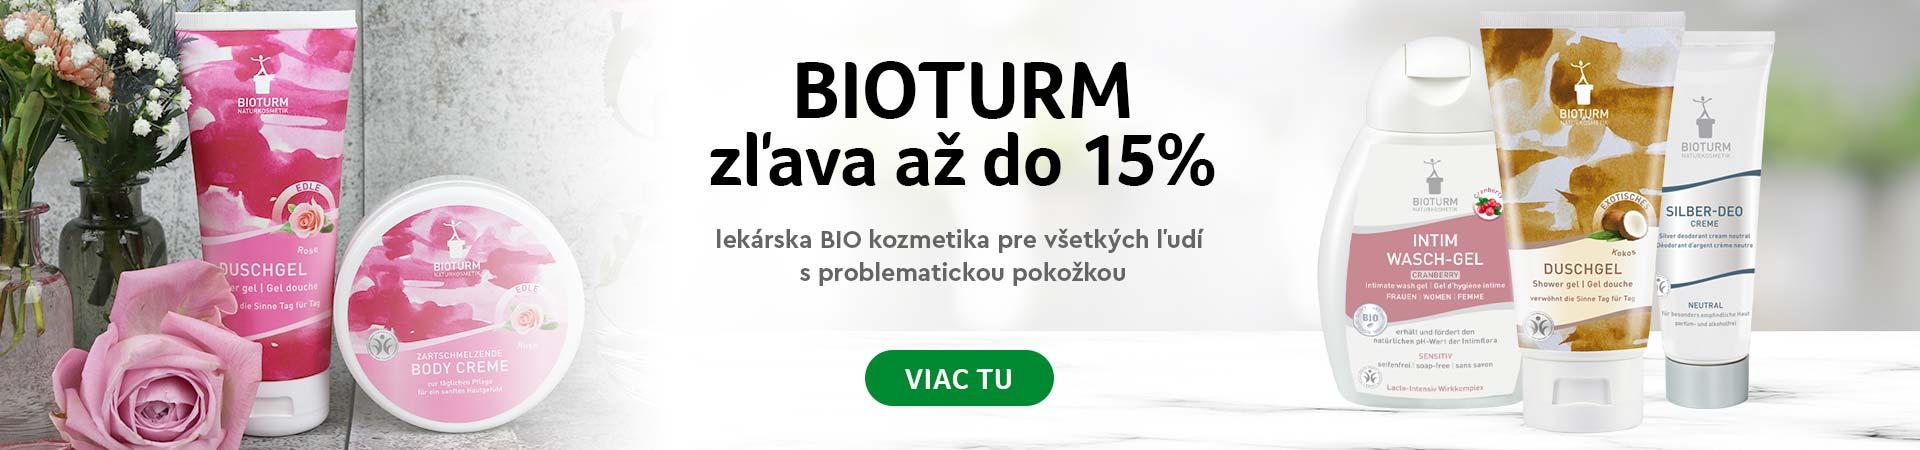 Zľava 15% kozmetika Bioturm